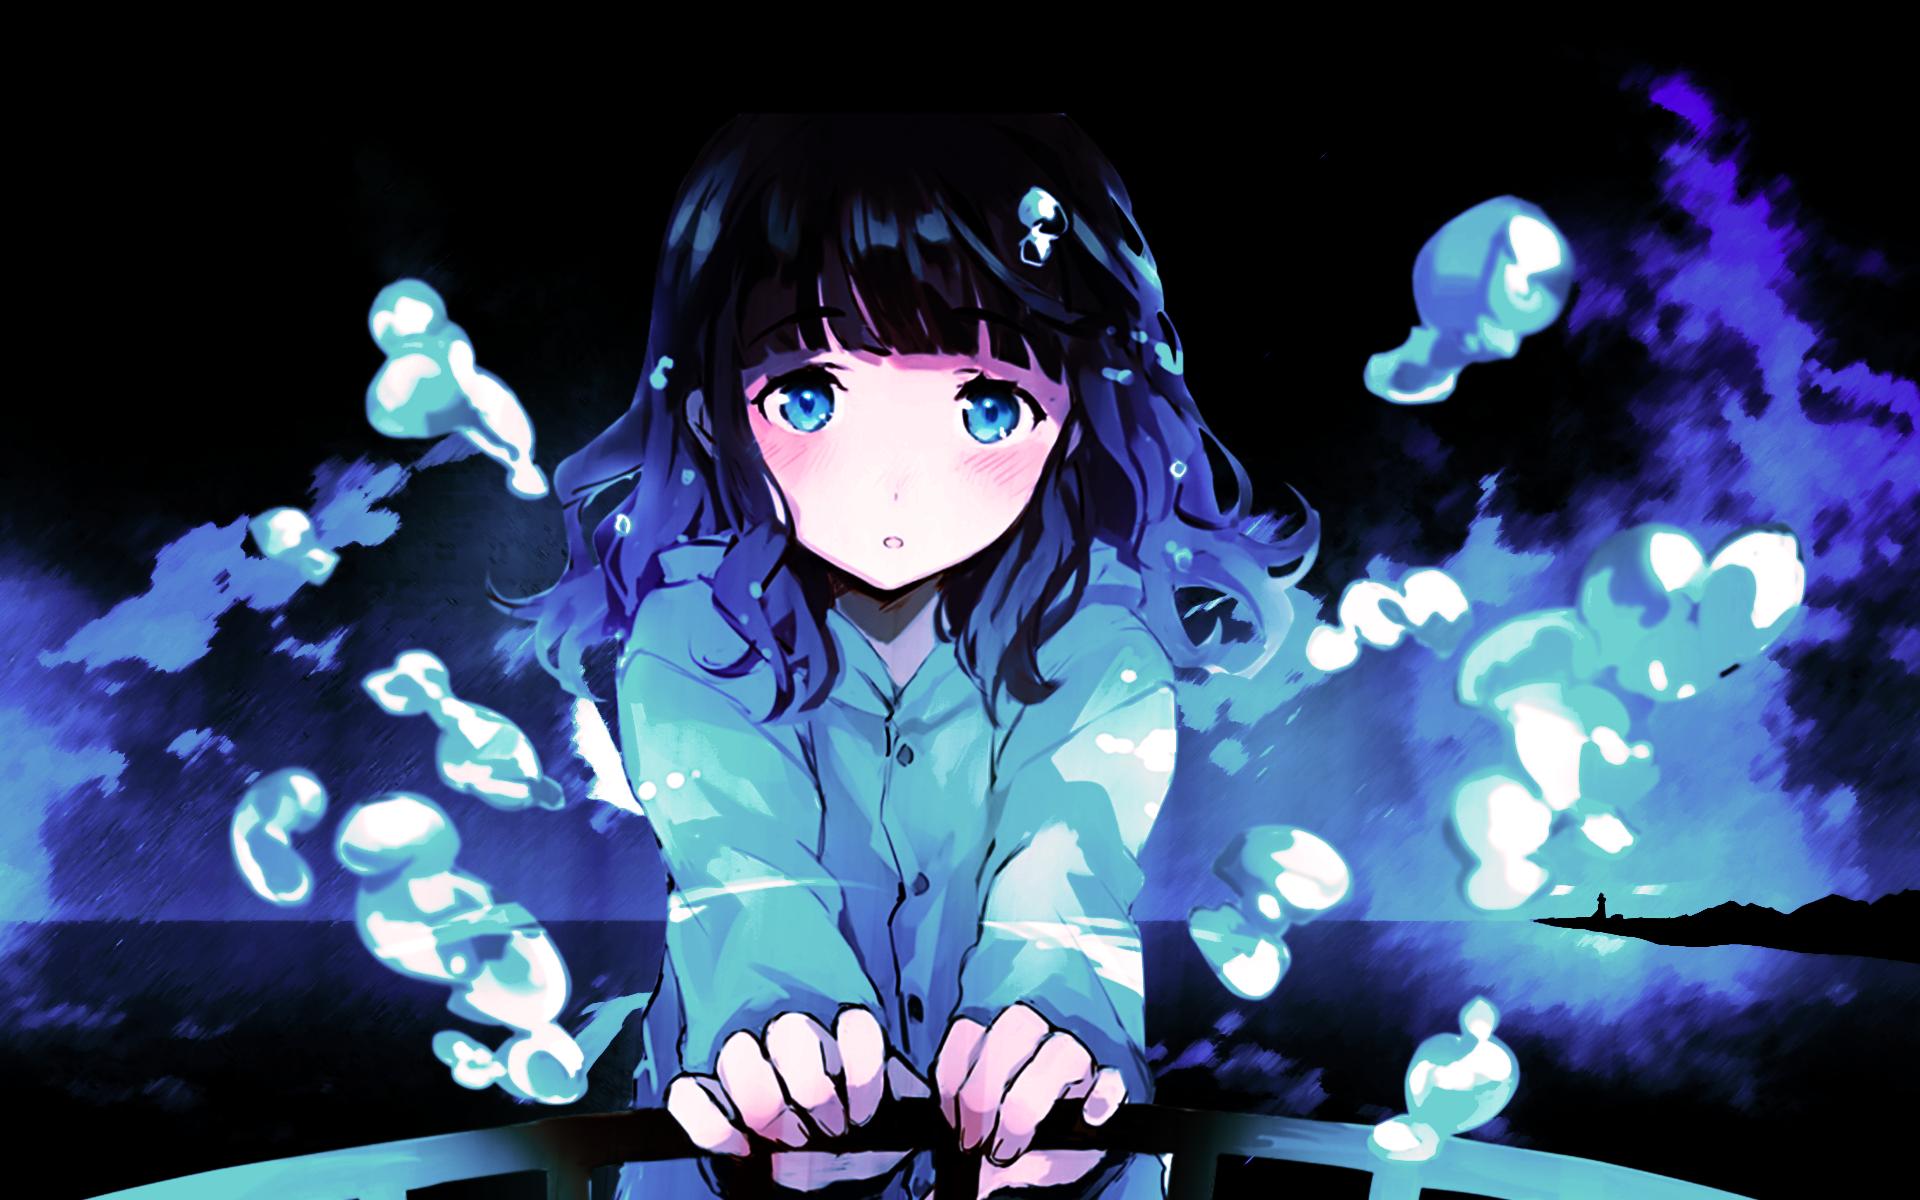 hinh nen anime girl dang yeu 14